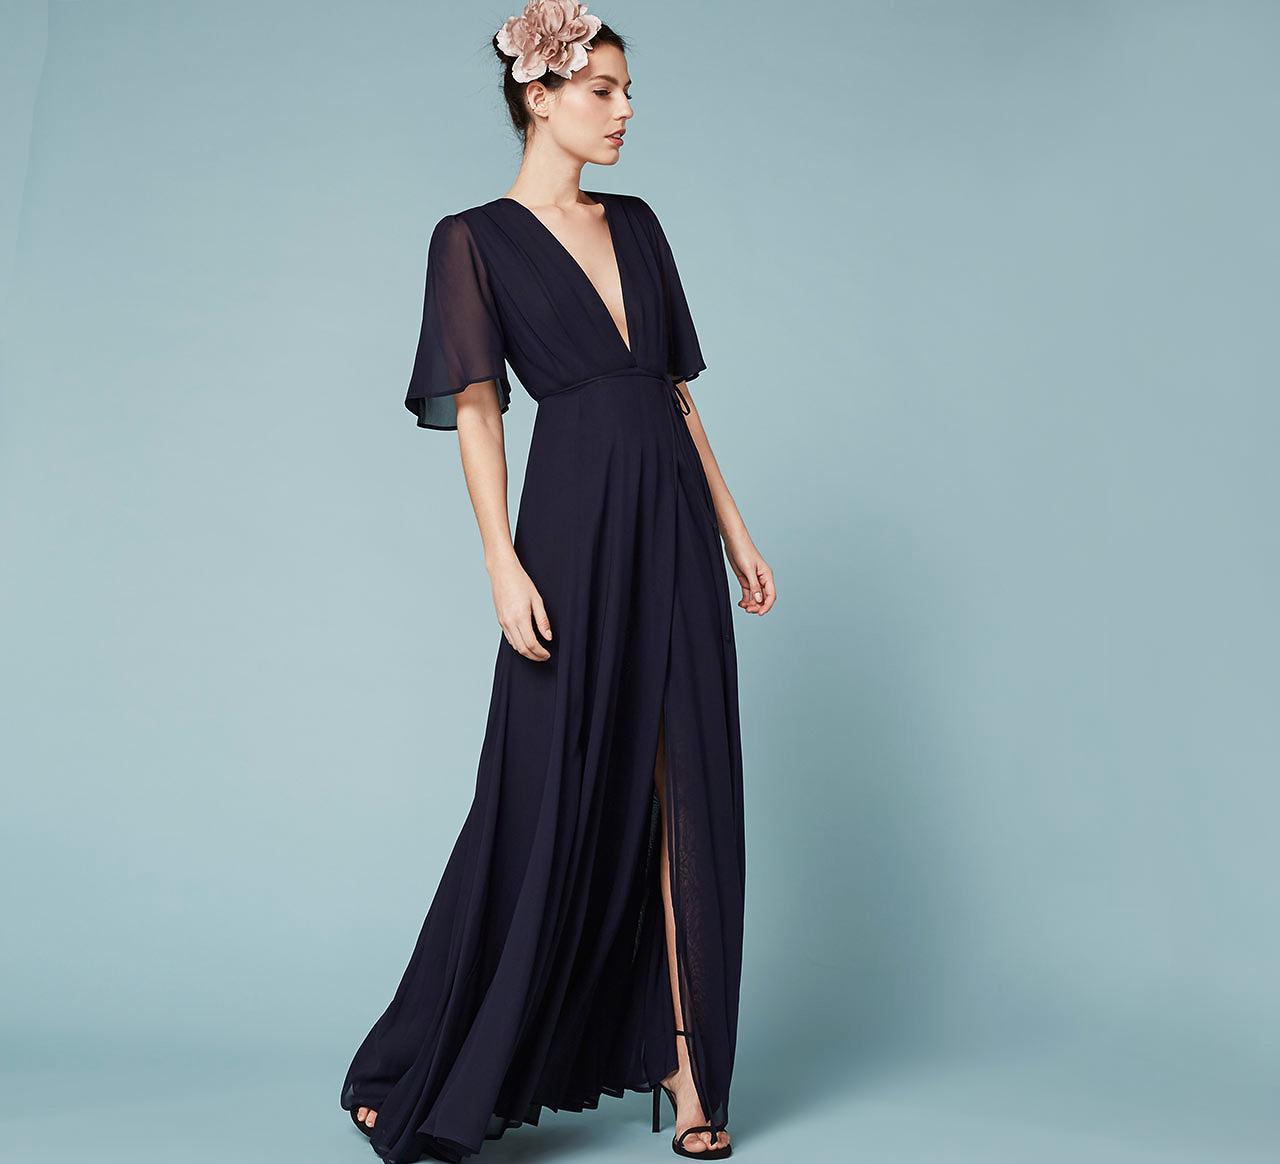 winter bridesmaid dress reformation catalina navy chiffon